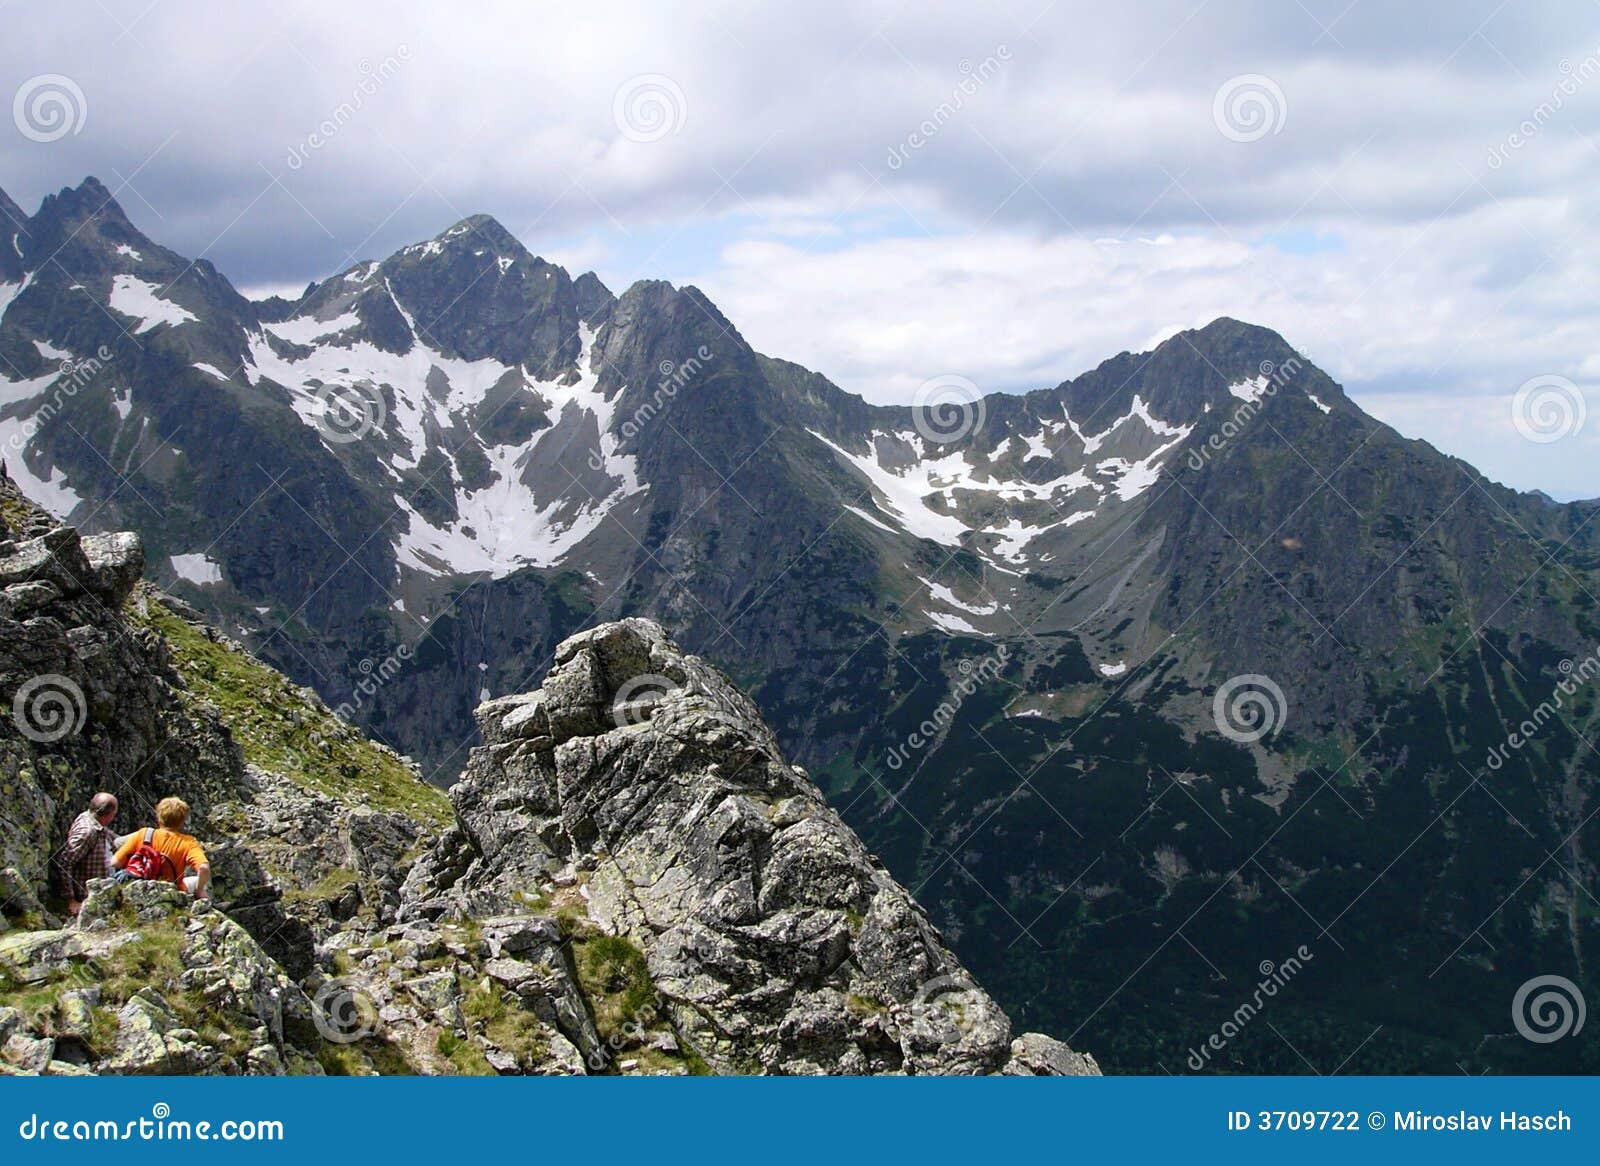 The High Tatras Mountains, Slovakia